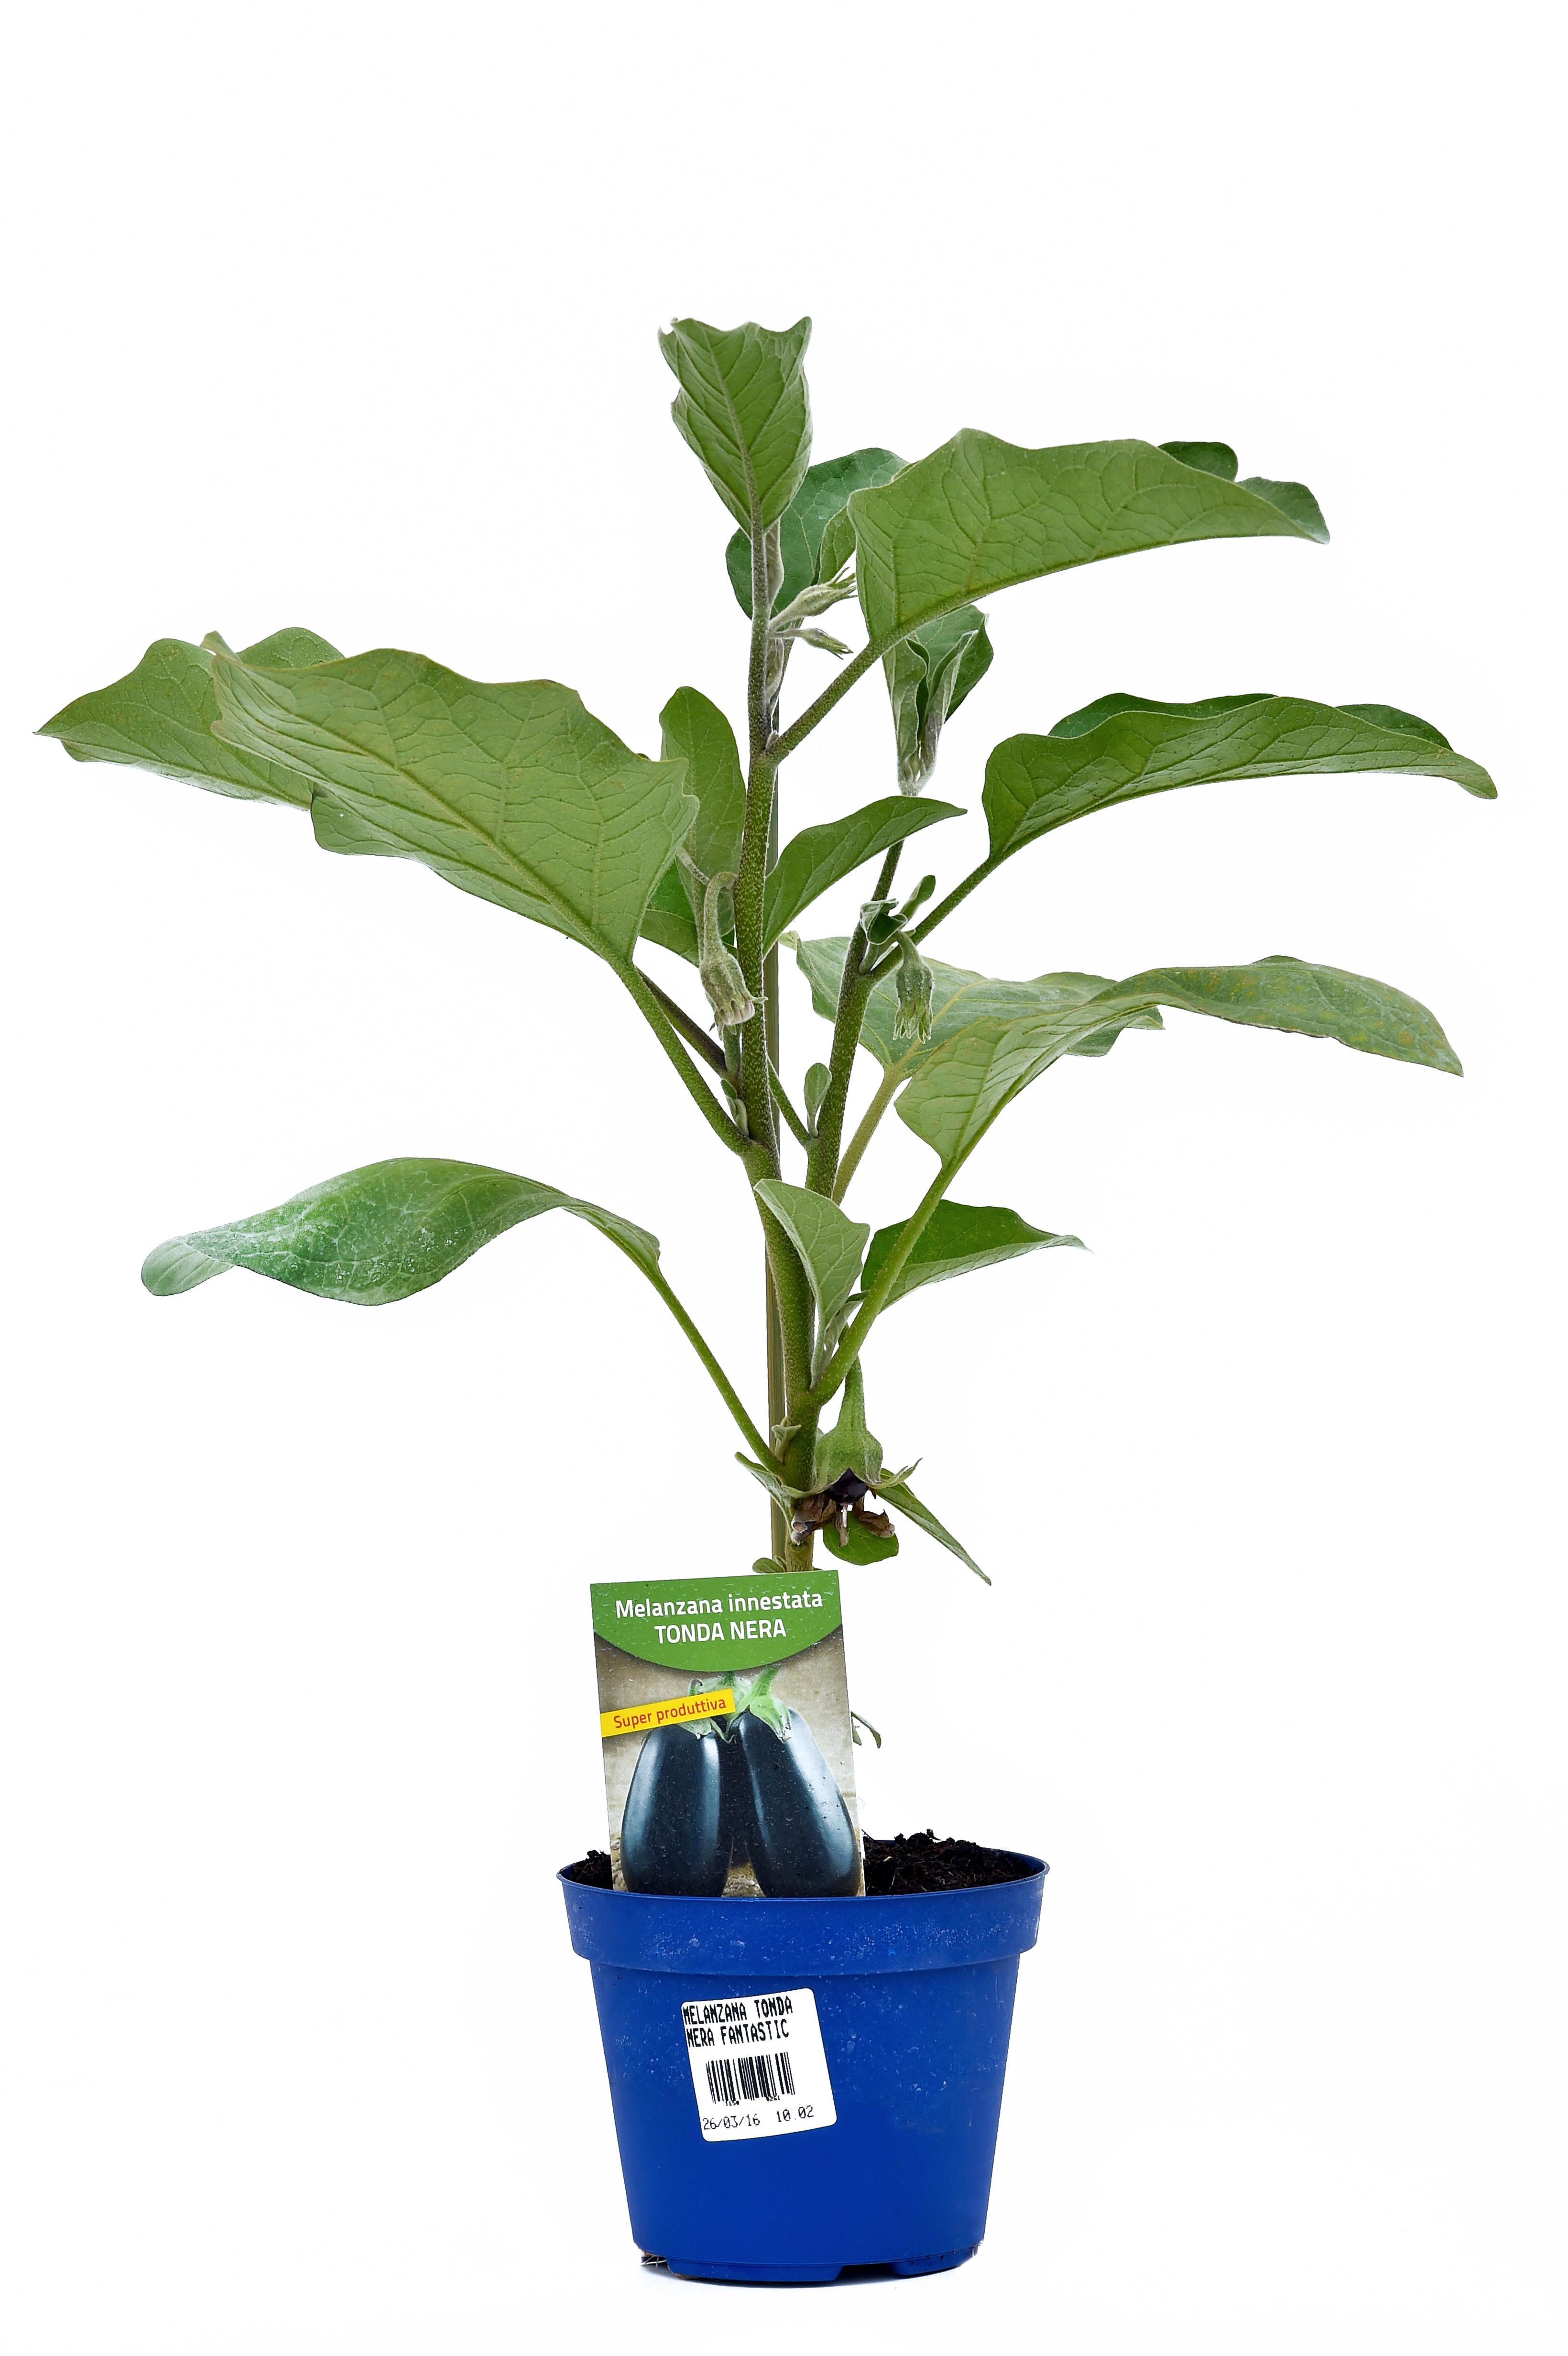 pianta di melanzana innestata tonda nera agata f1 in vaso